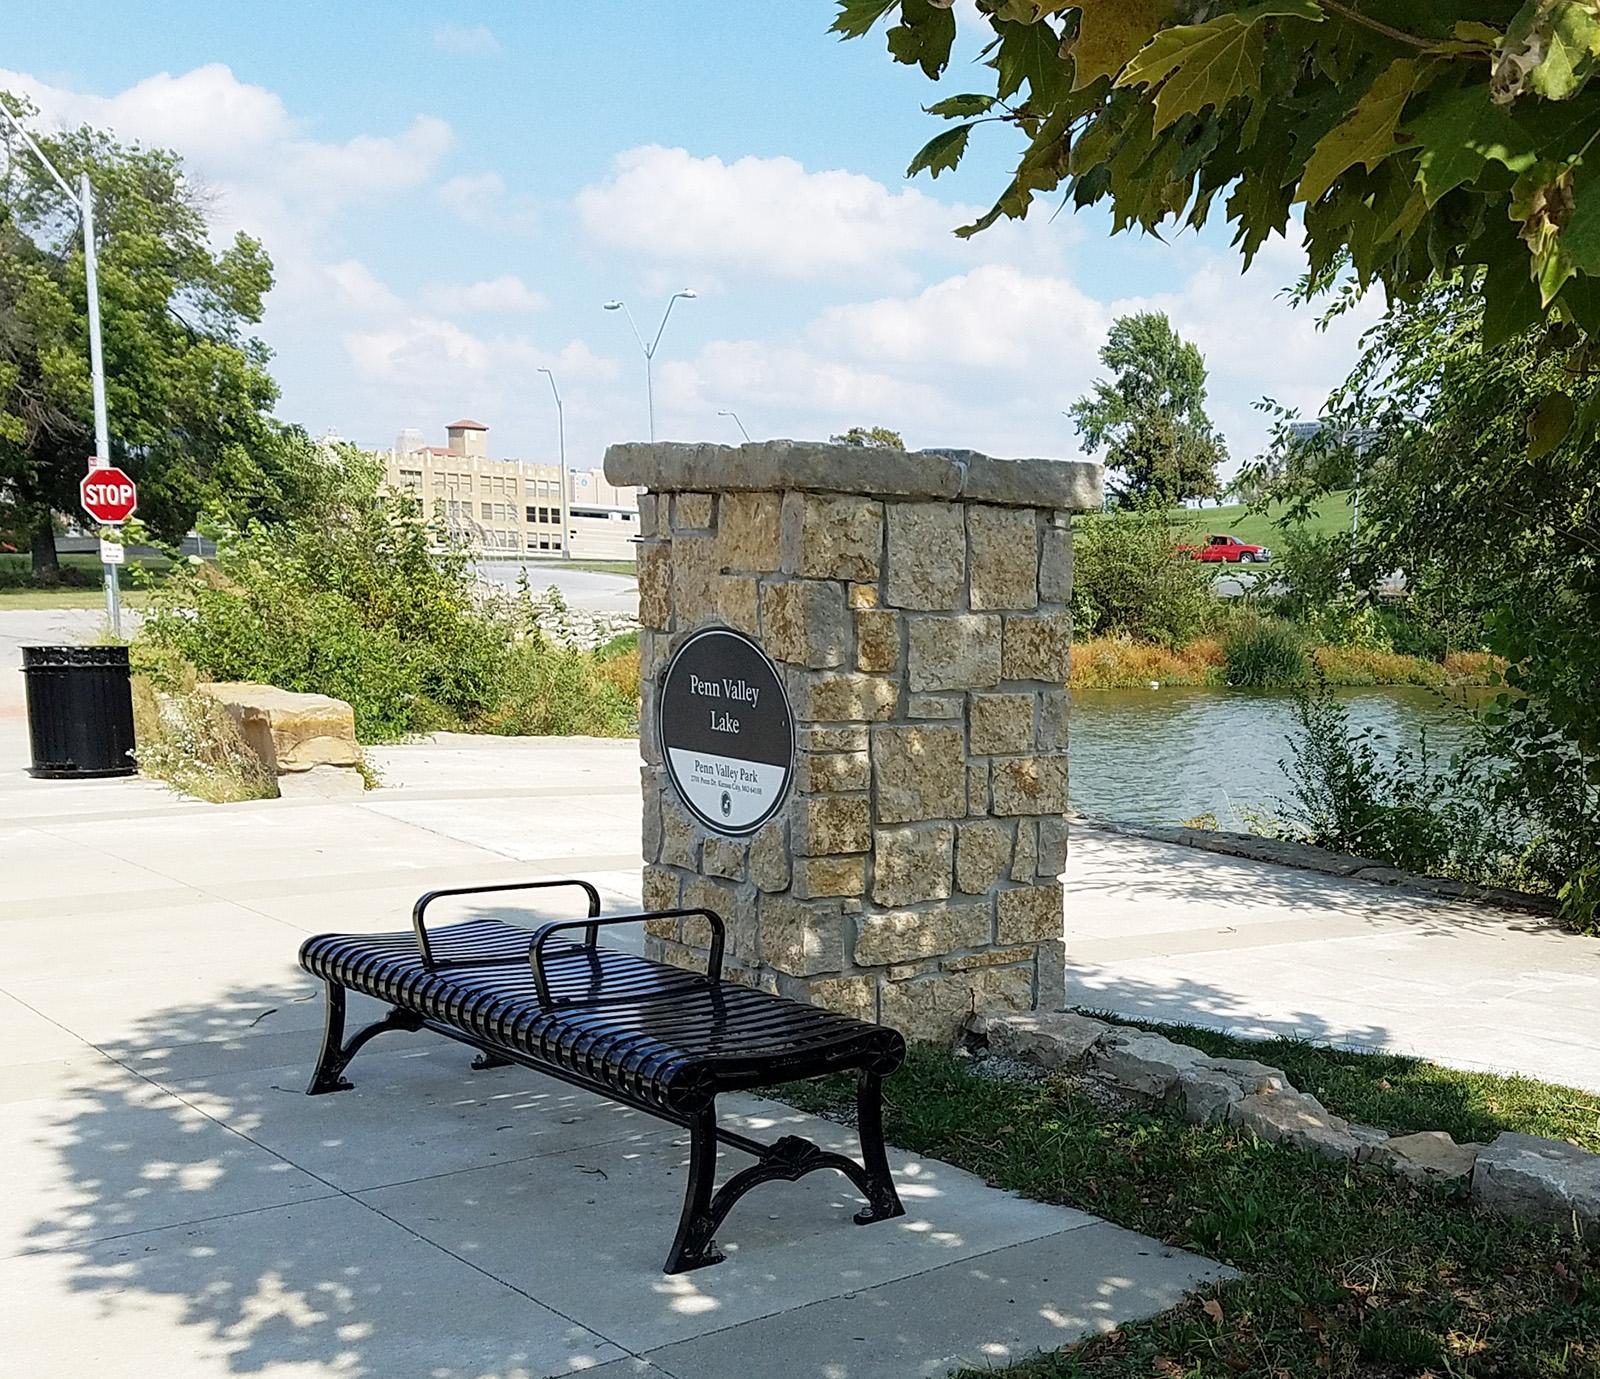 Penn Valley Park Signage & Branding